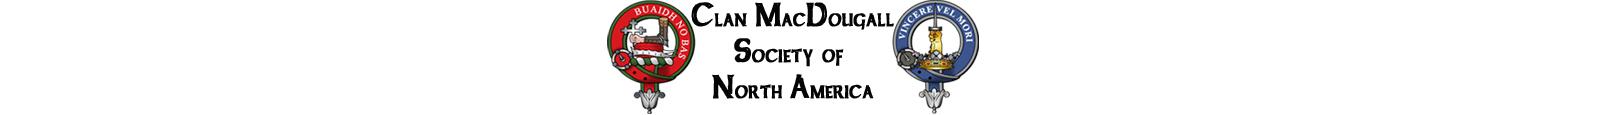 Clan MacDougall Society of North America